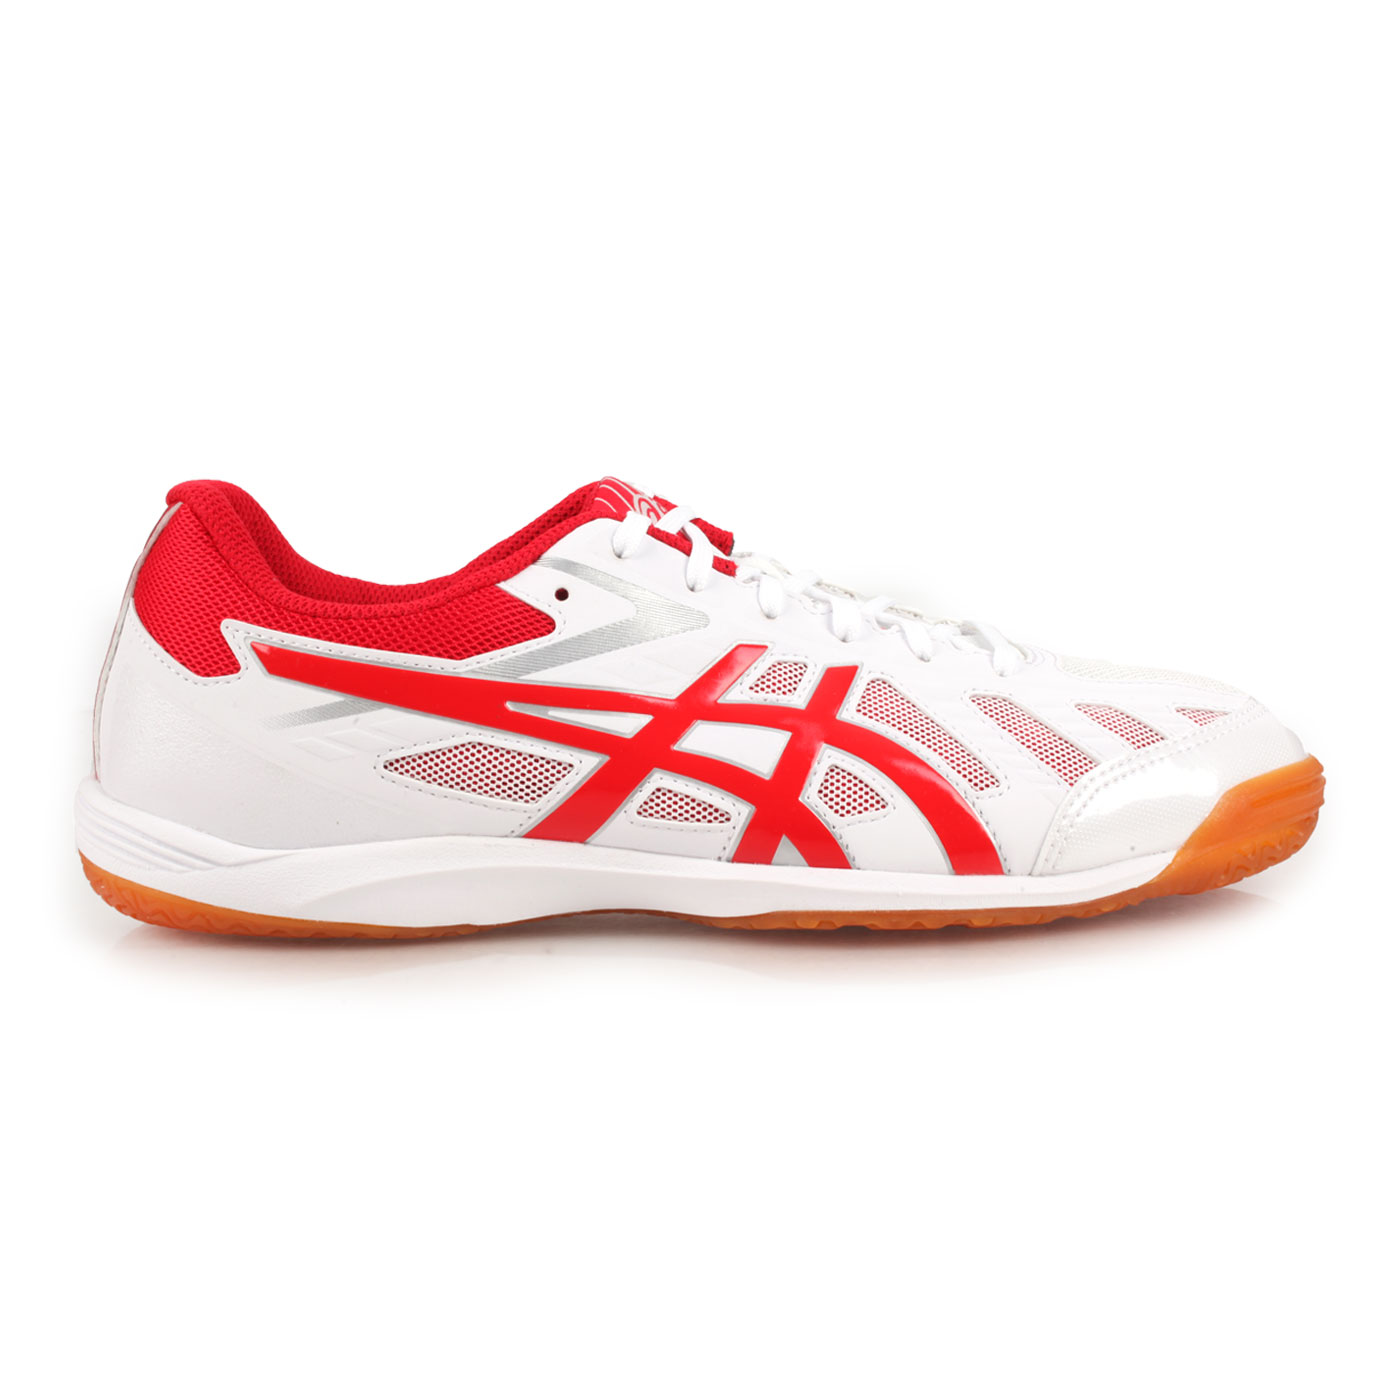 ASICS 桌球鞋  @ATTACK HYPERBEAT SP 3@1073A004-101 - 白紅